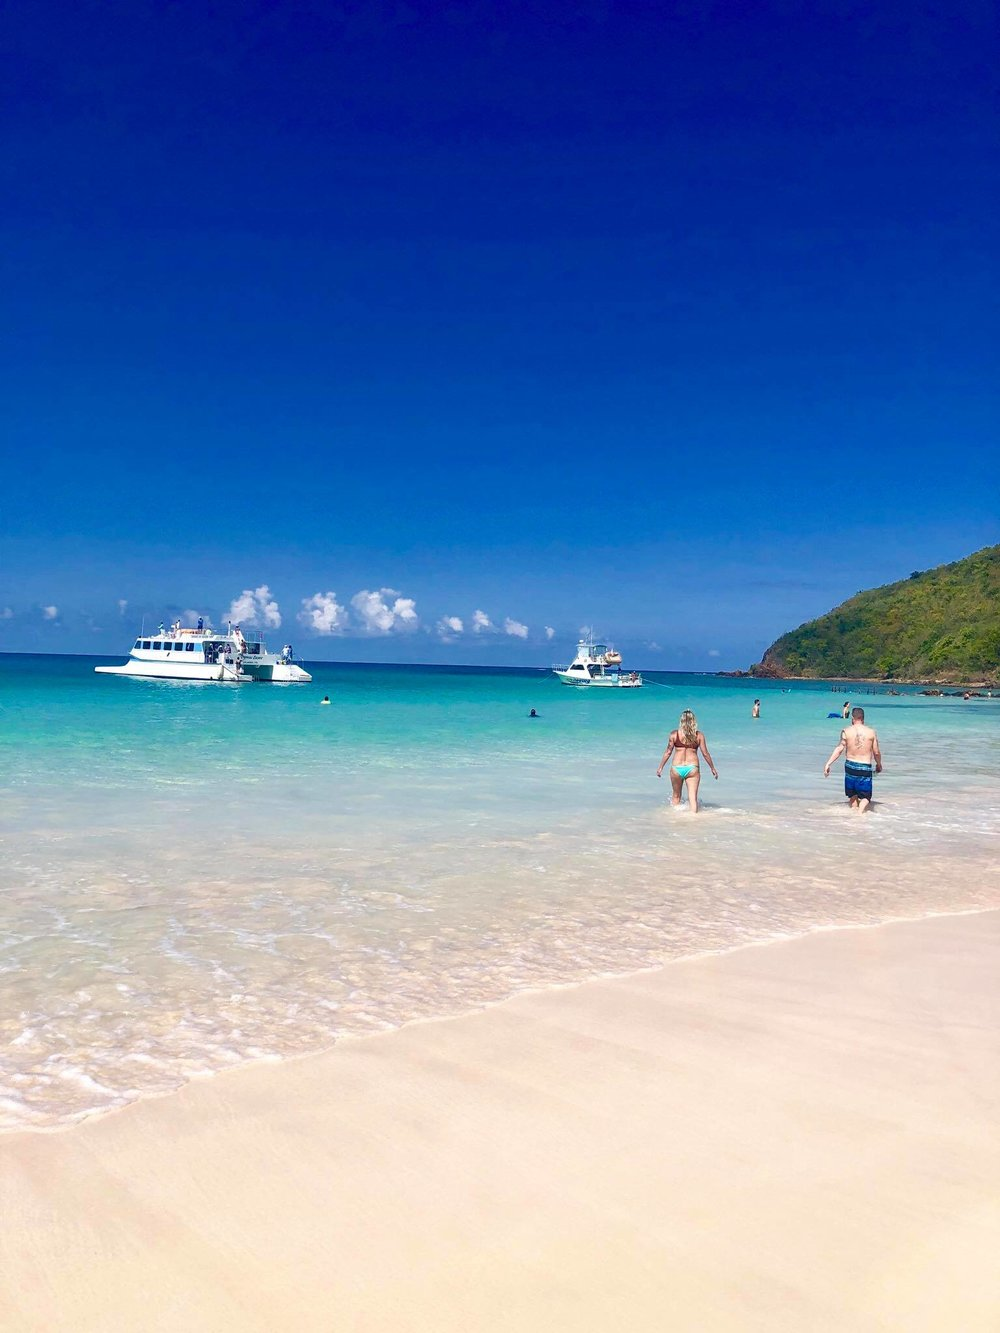 Sailing Life Day 349 Day trip to Culebra3.jpg